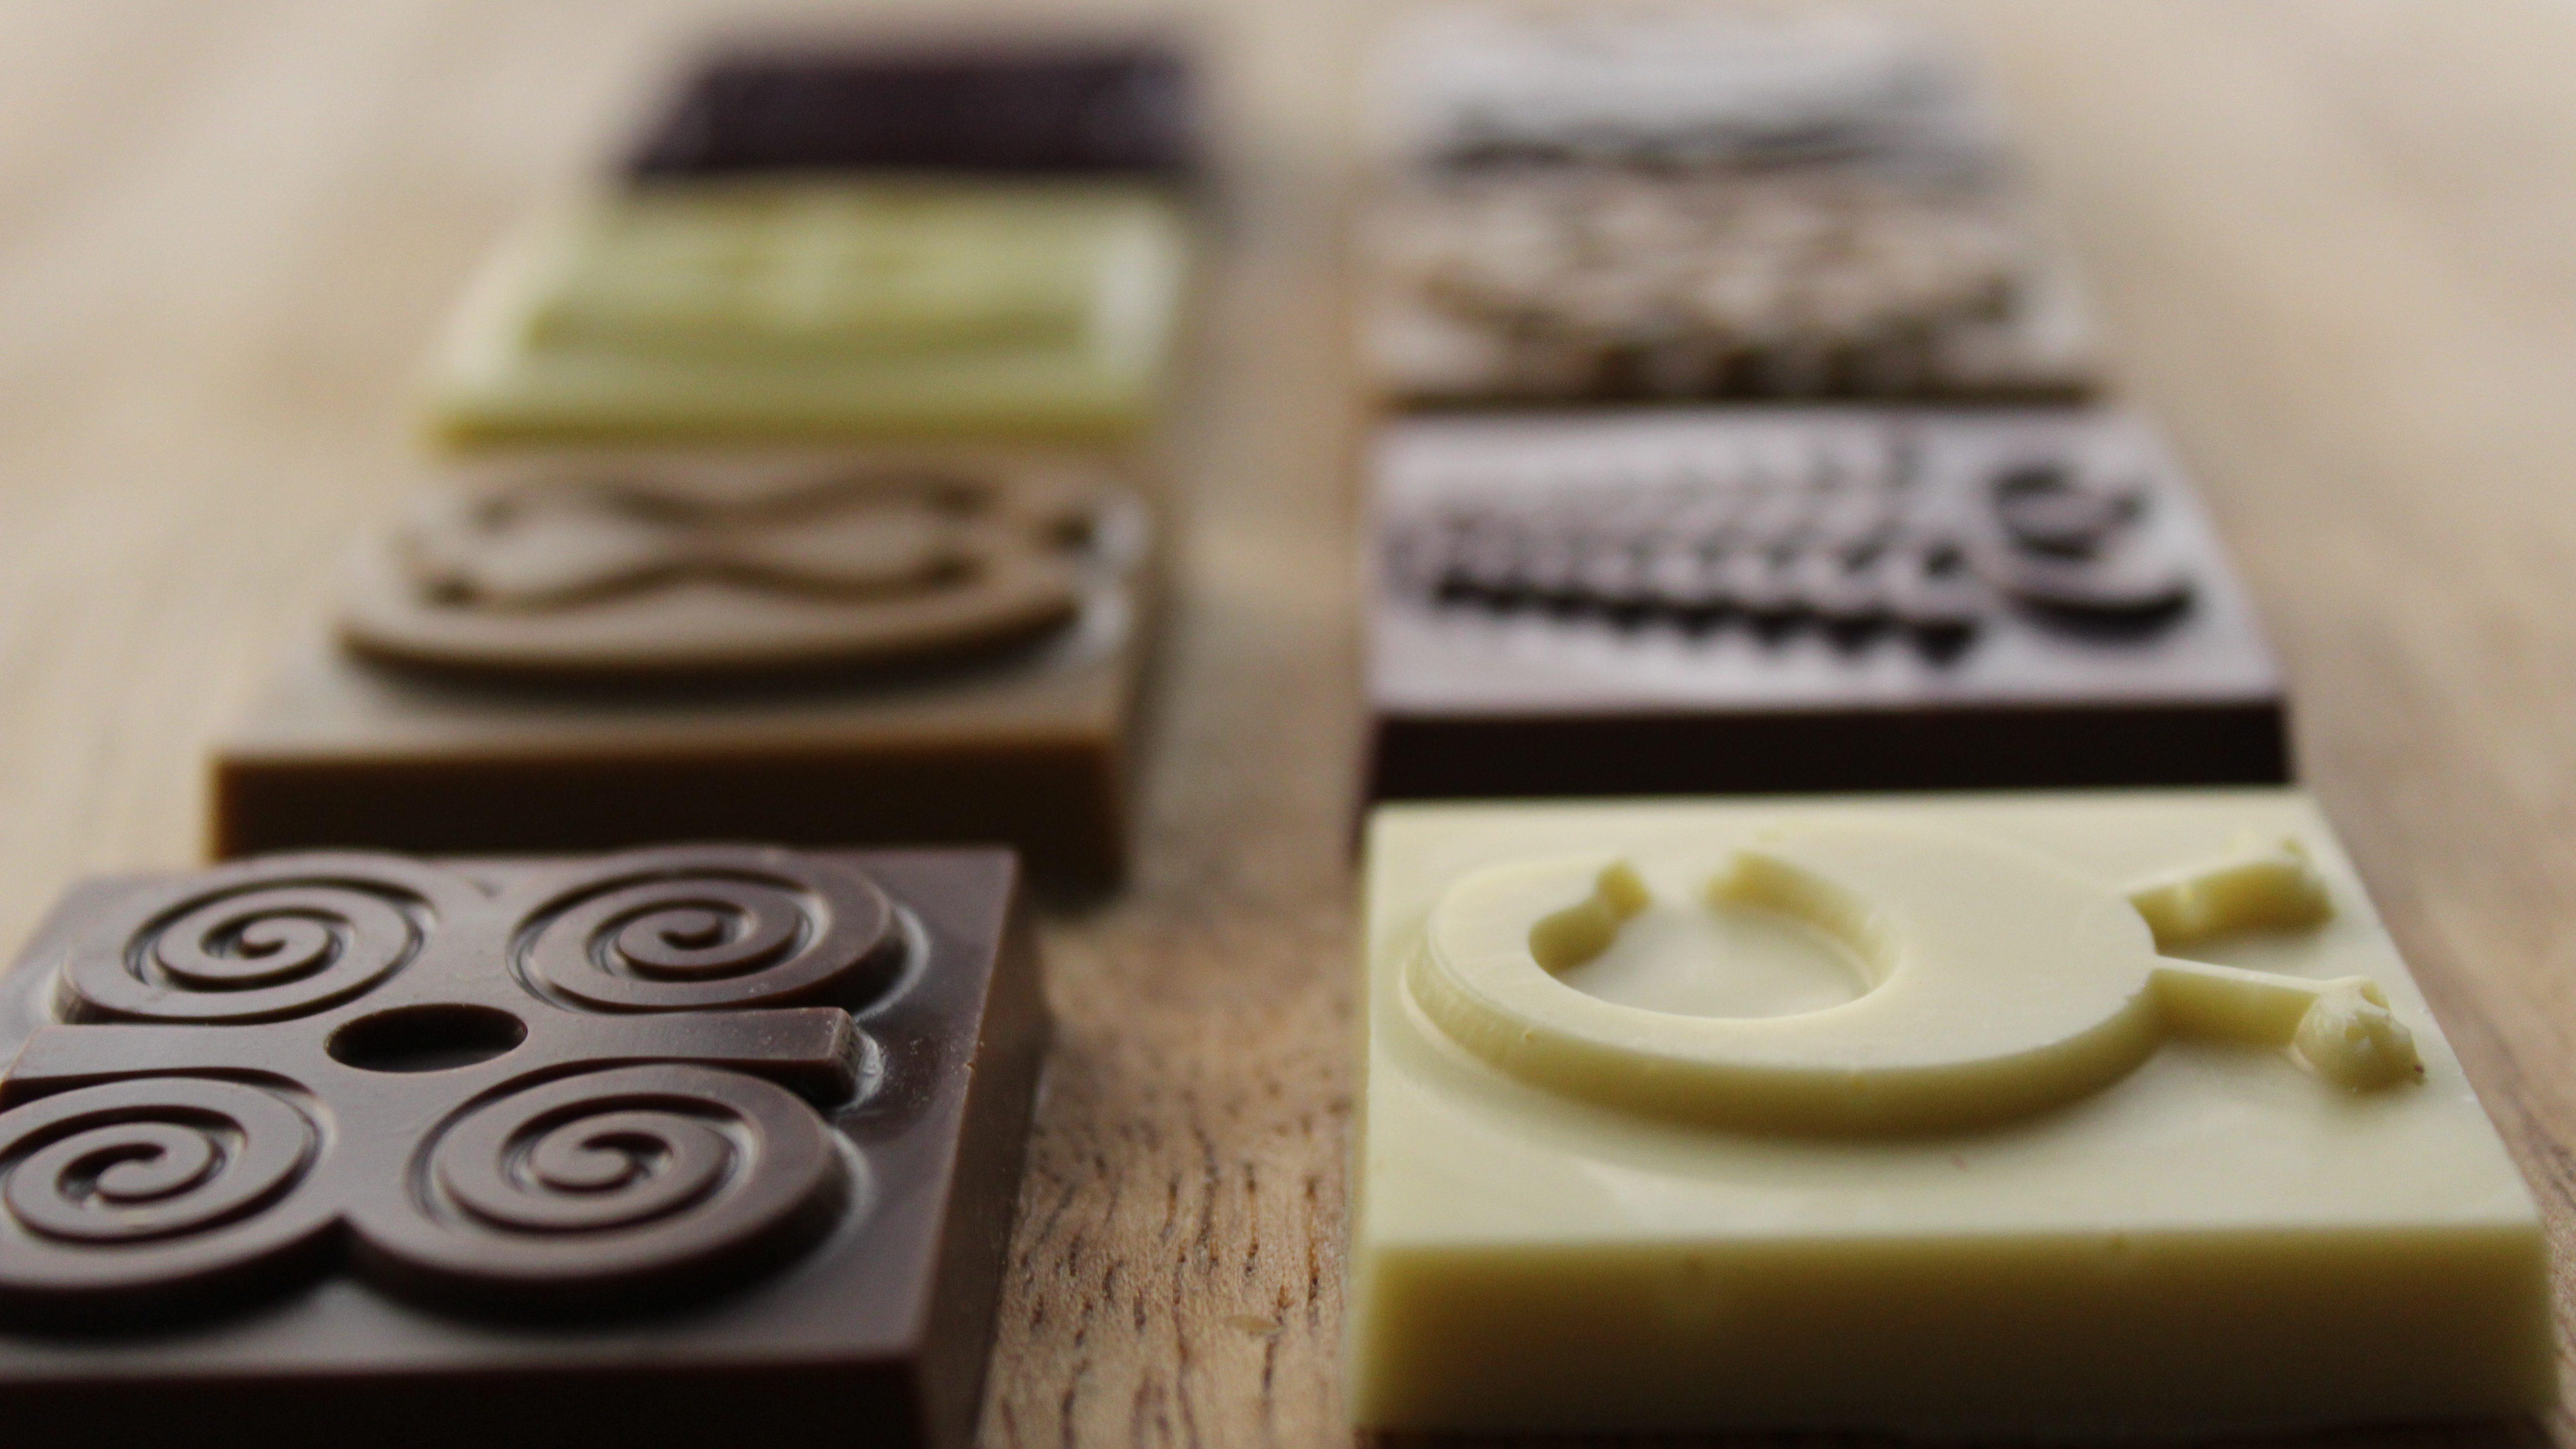 Ghana Ivory Coast Are Marketing More Chocolate To The World